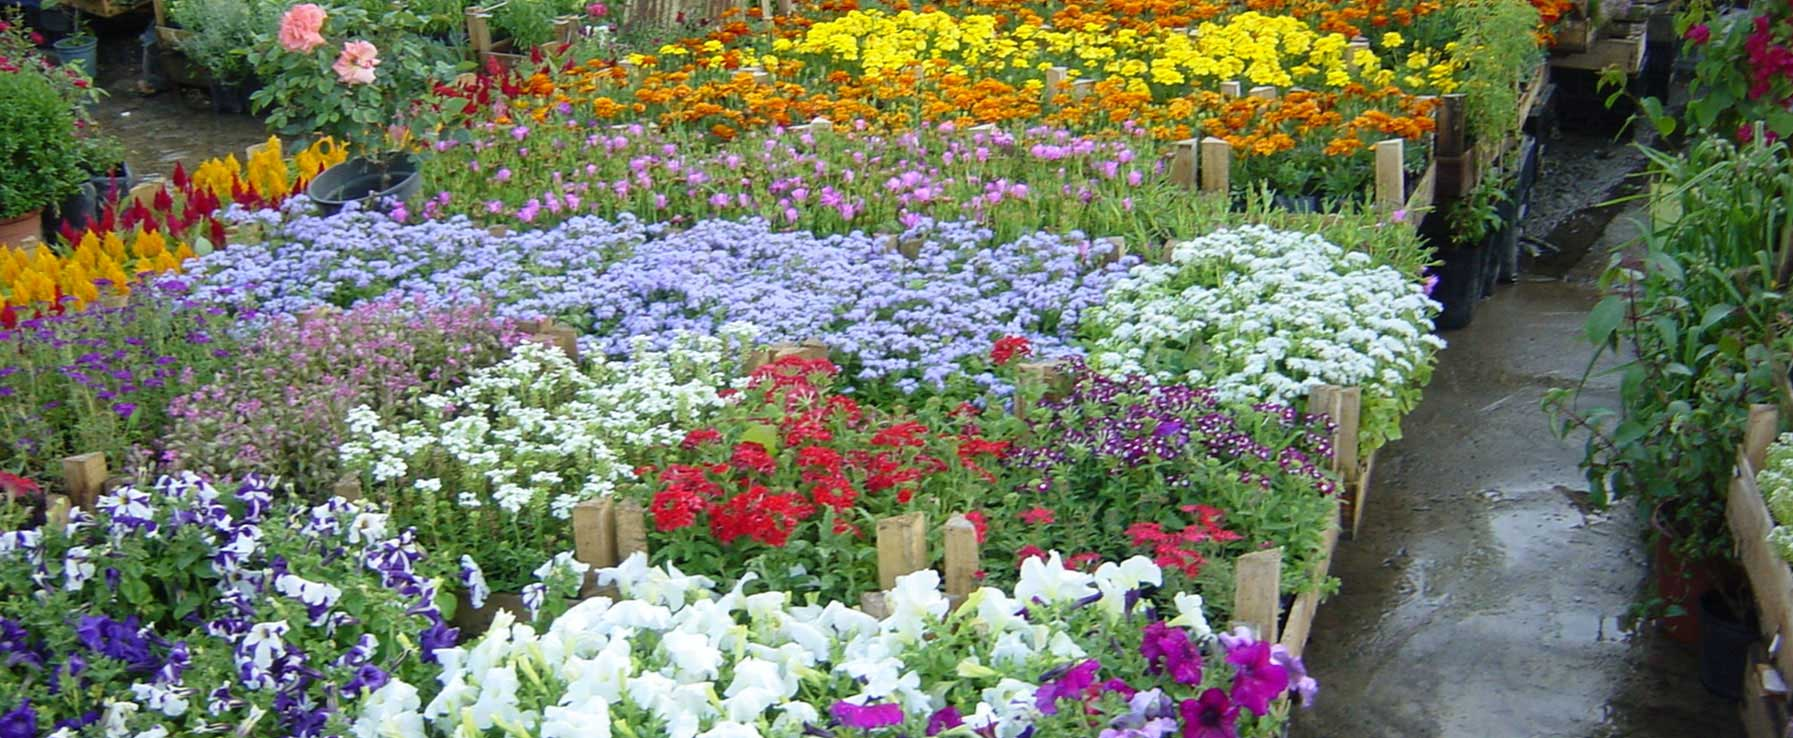 Garden center milano vivai progetto verde for Progetto verde